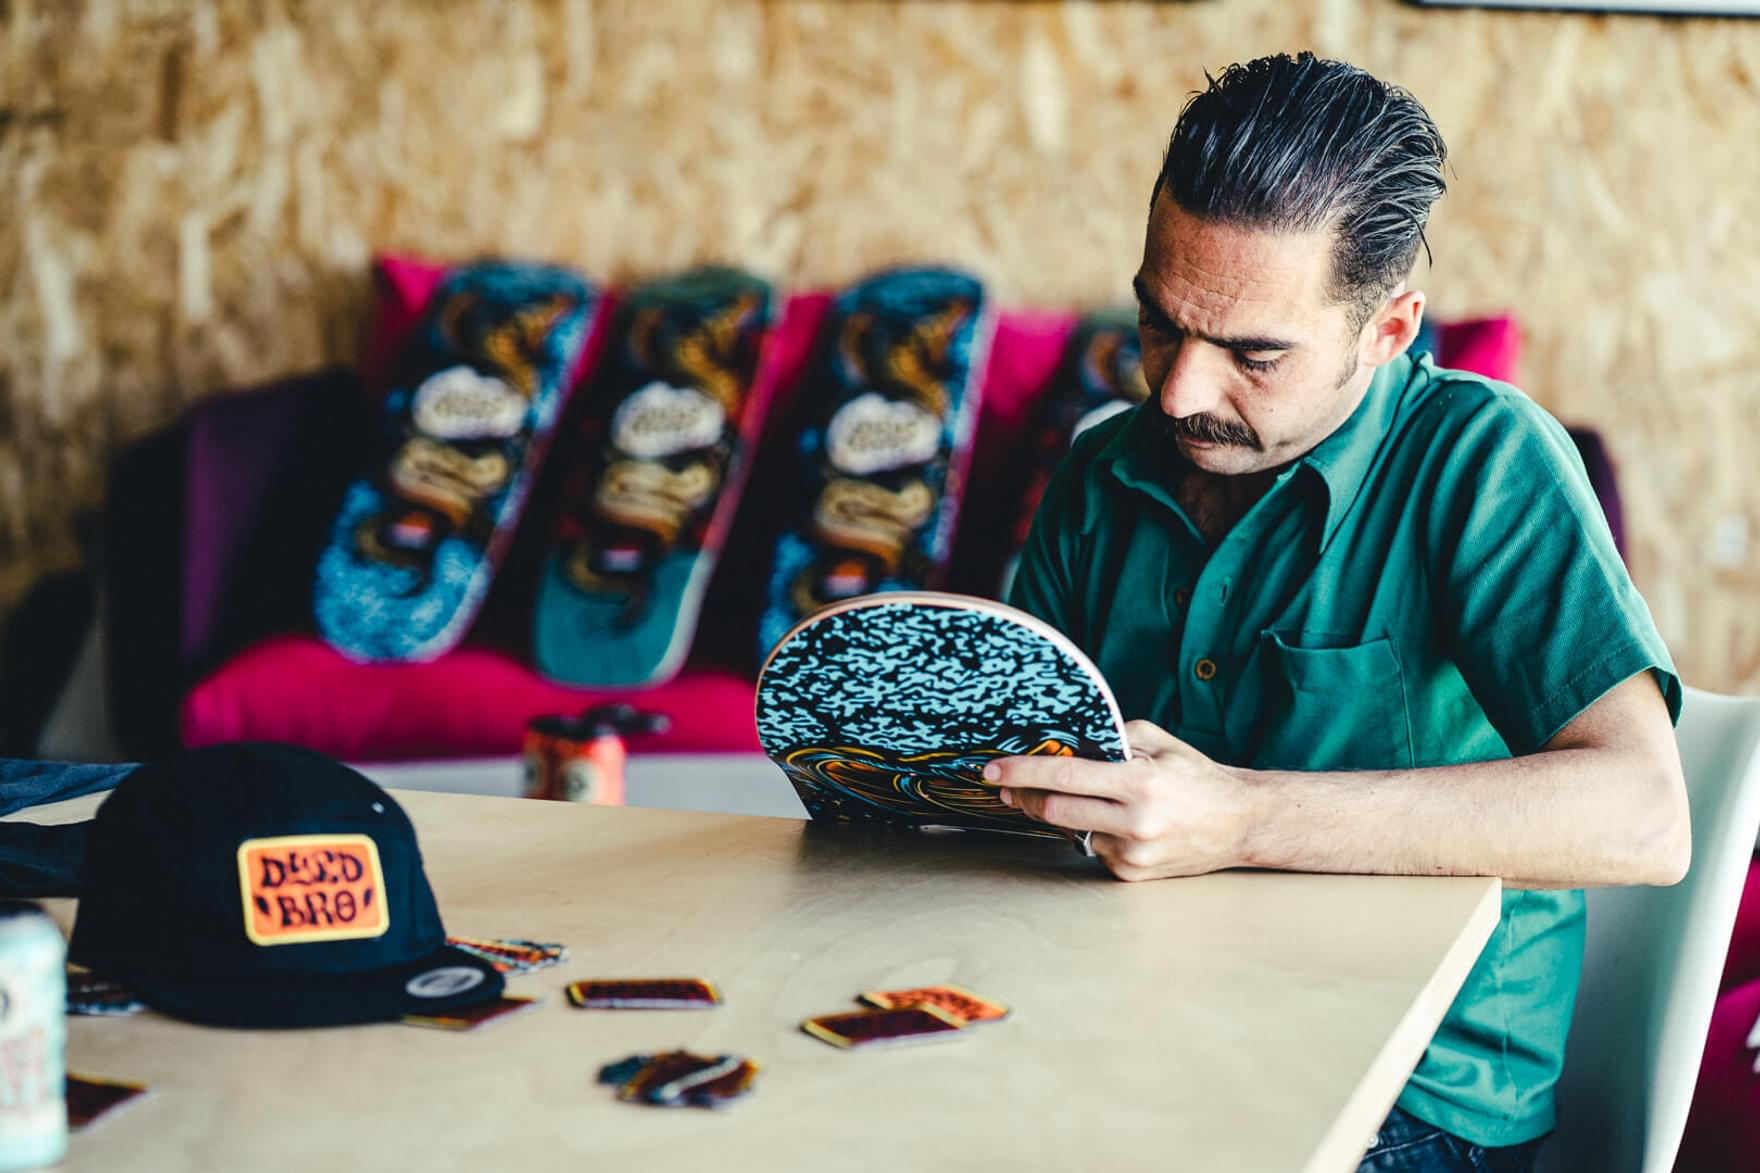 Dyed Bro Skate board